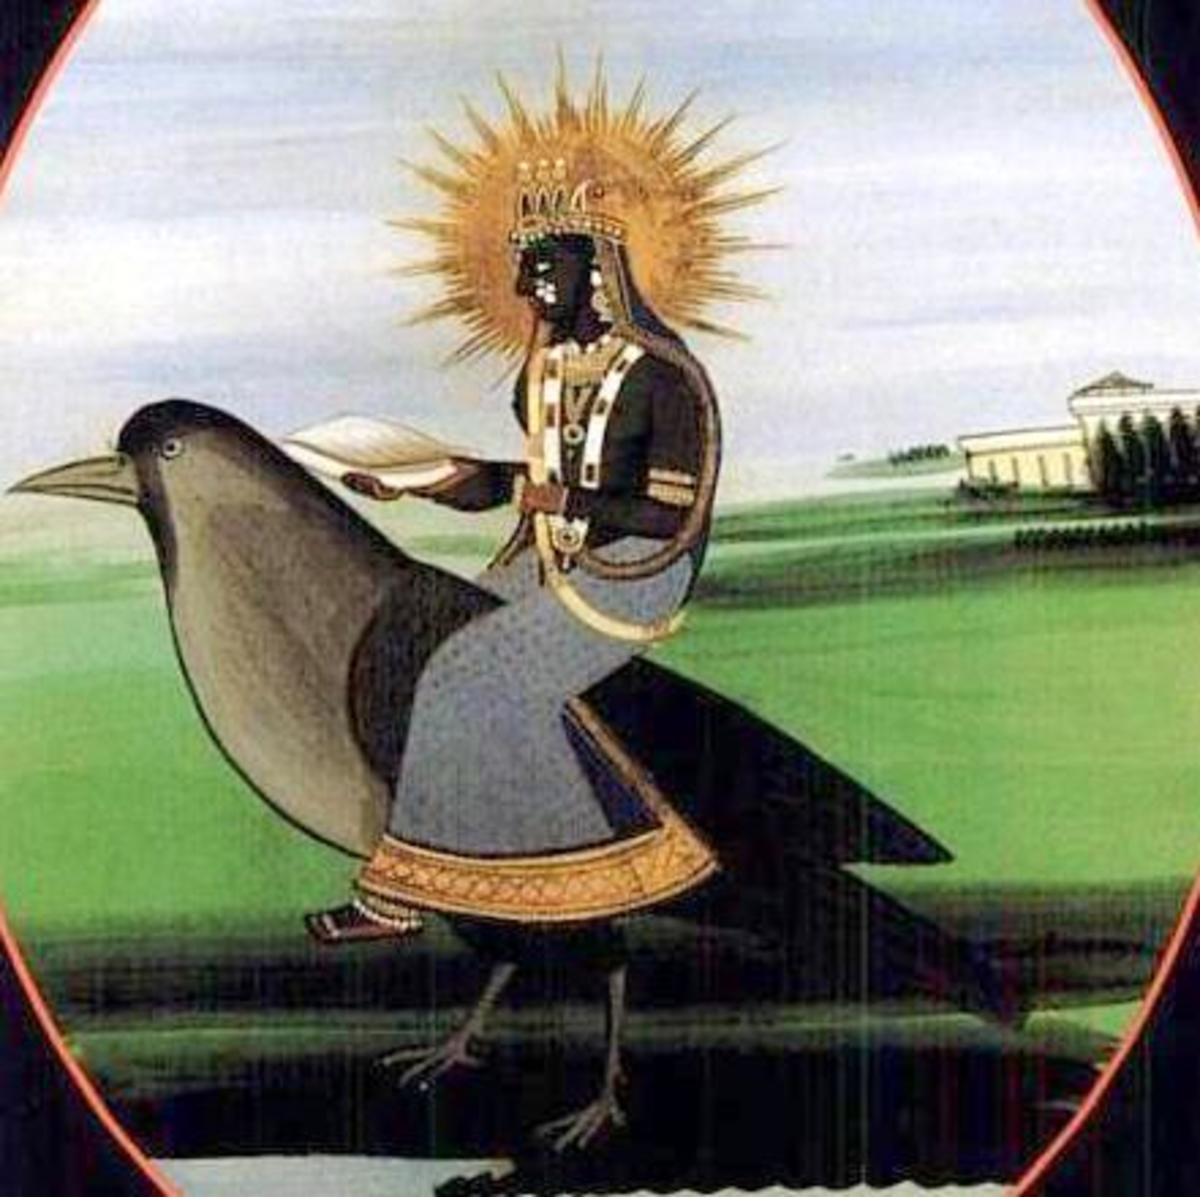 Goddess Dumavati riding a crow